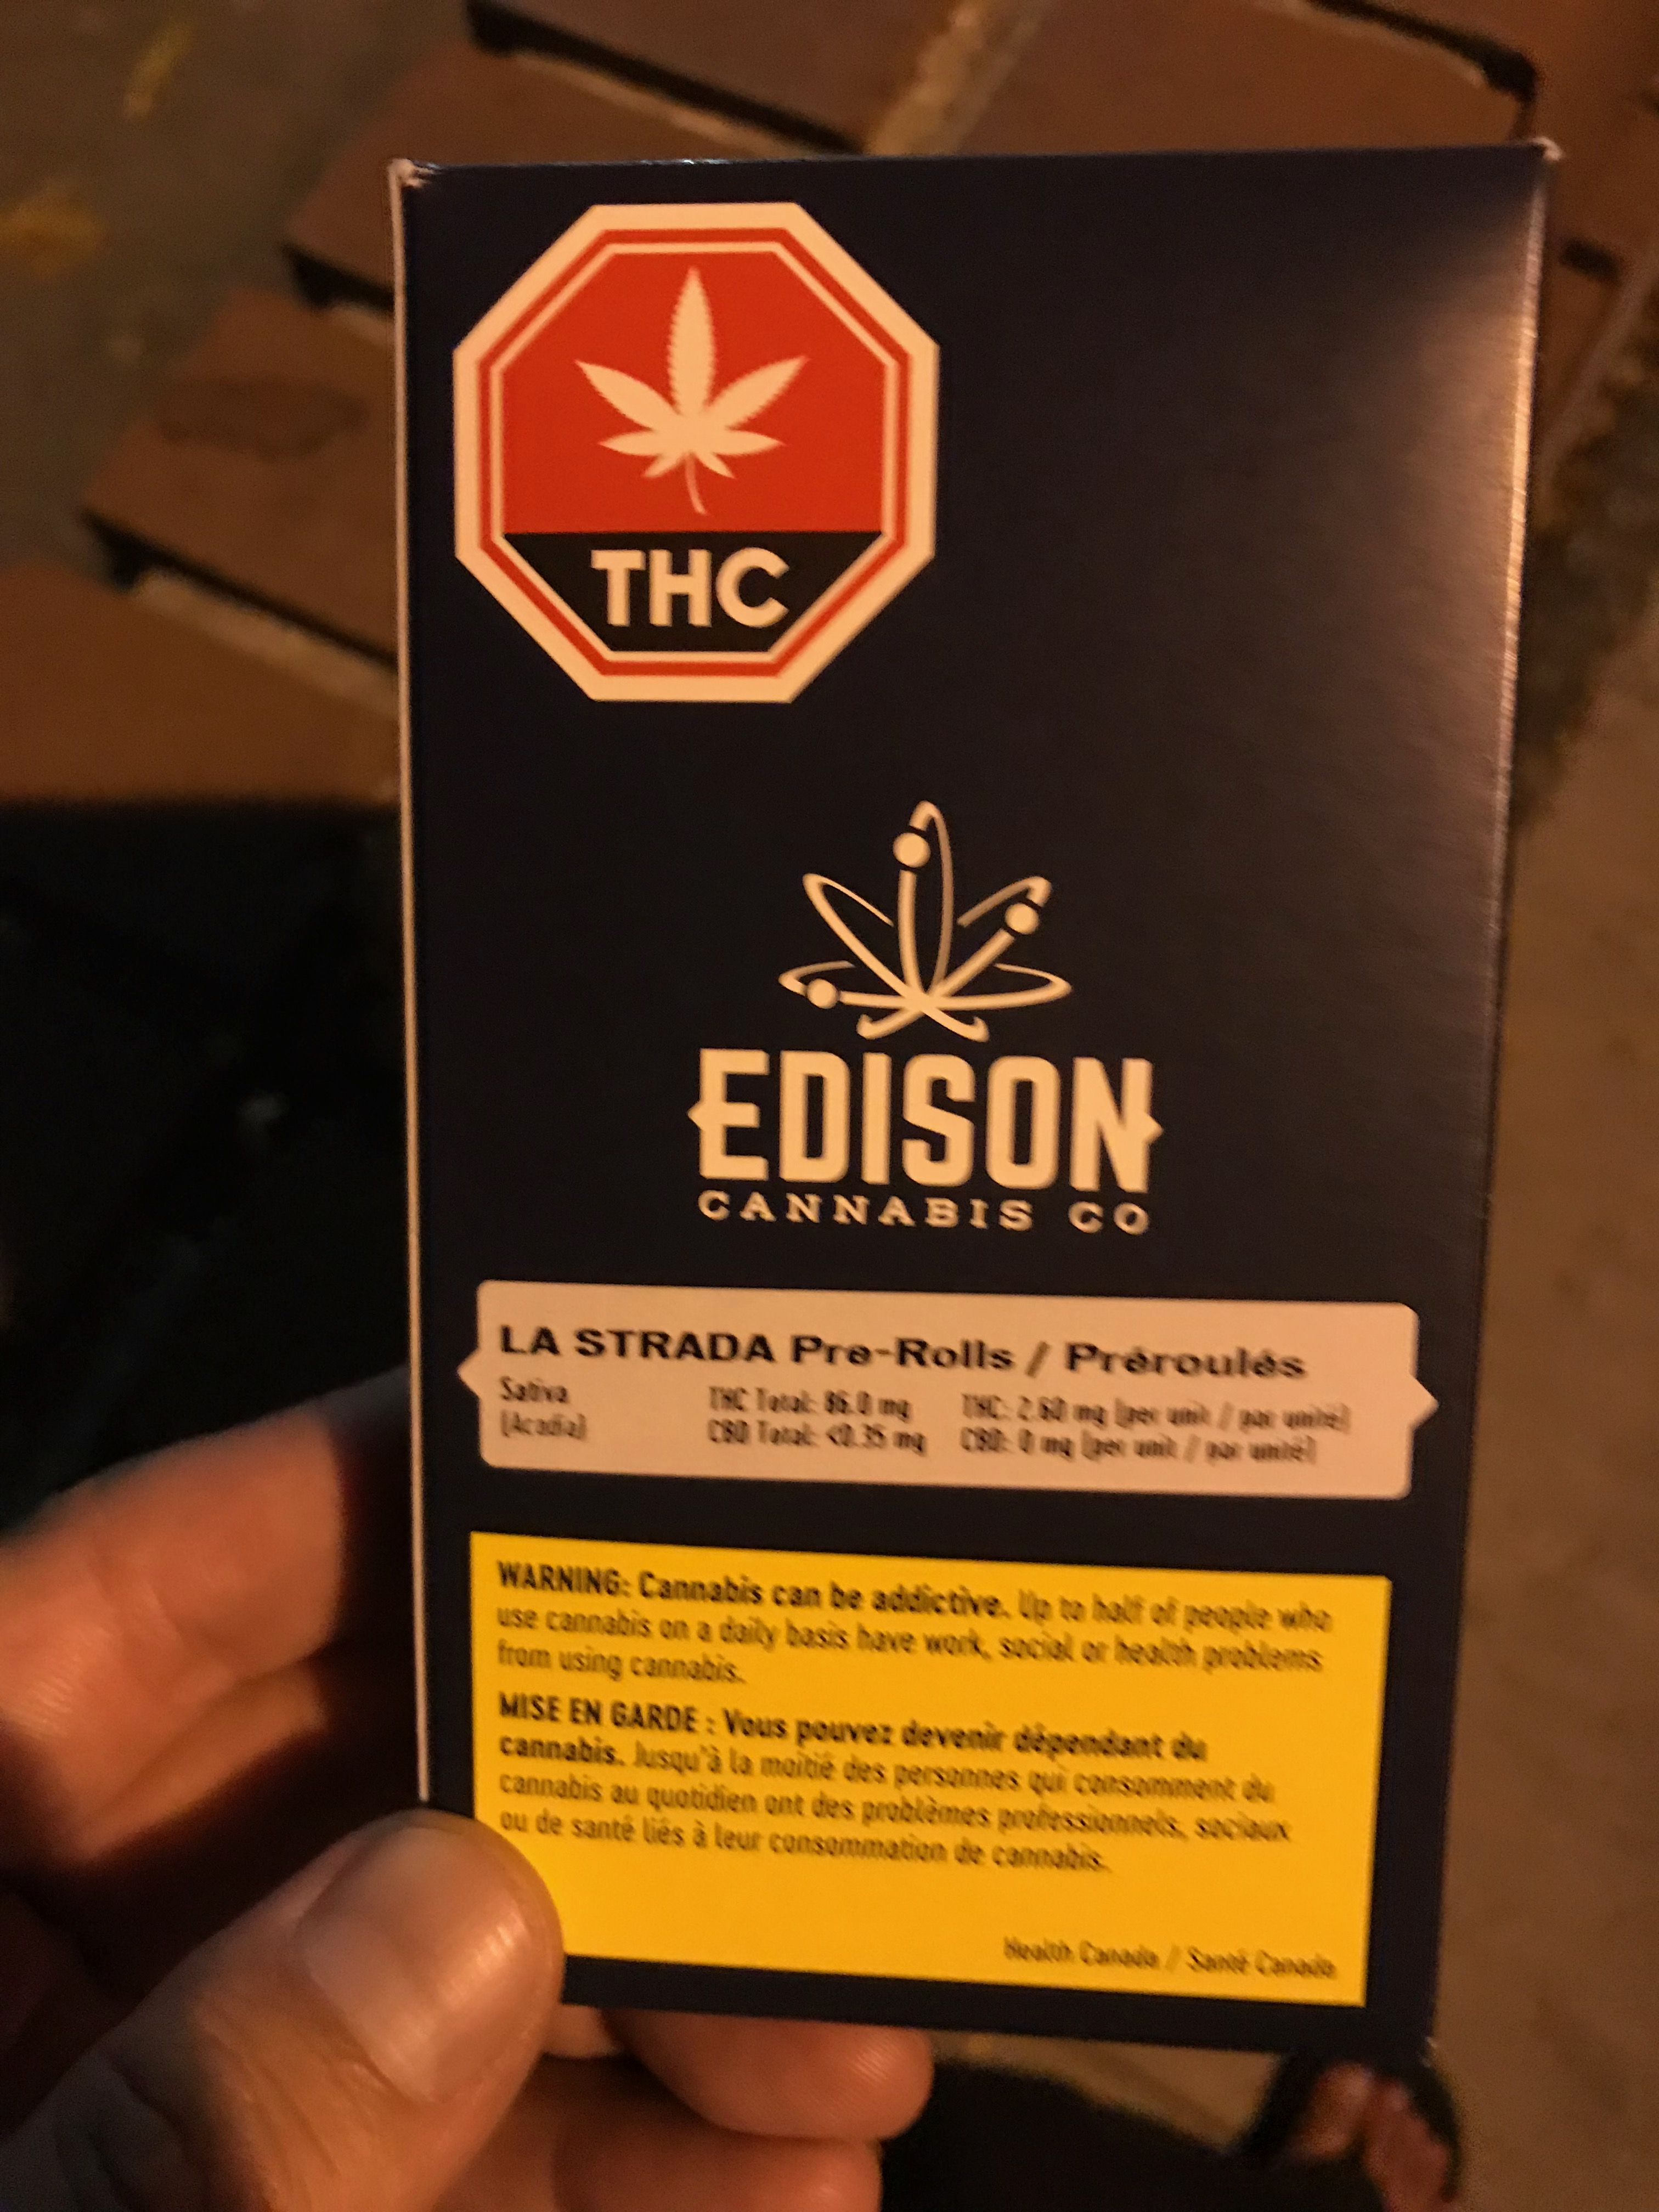 The Hunny Pot Cannabis